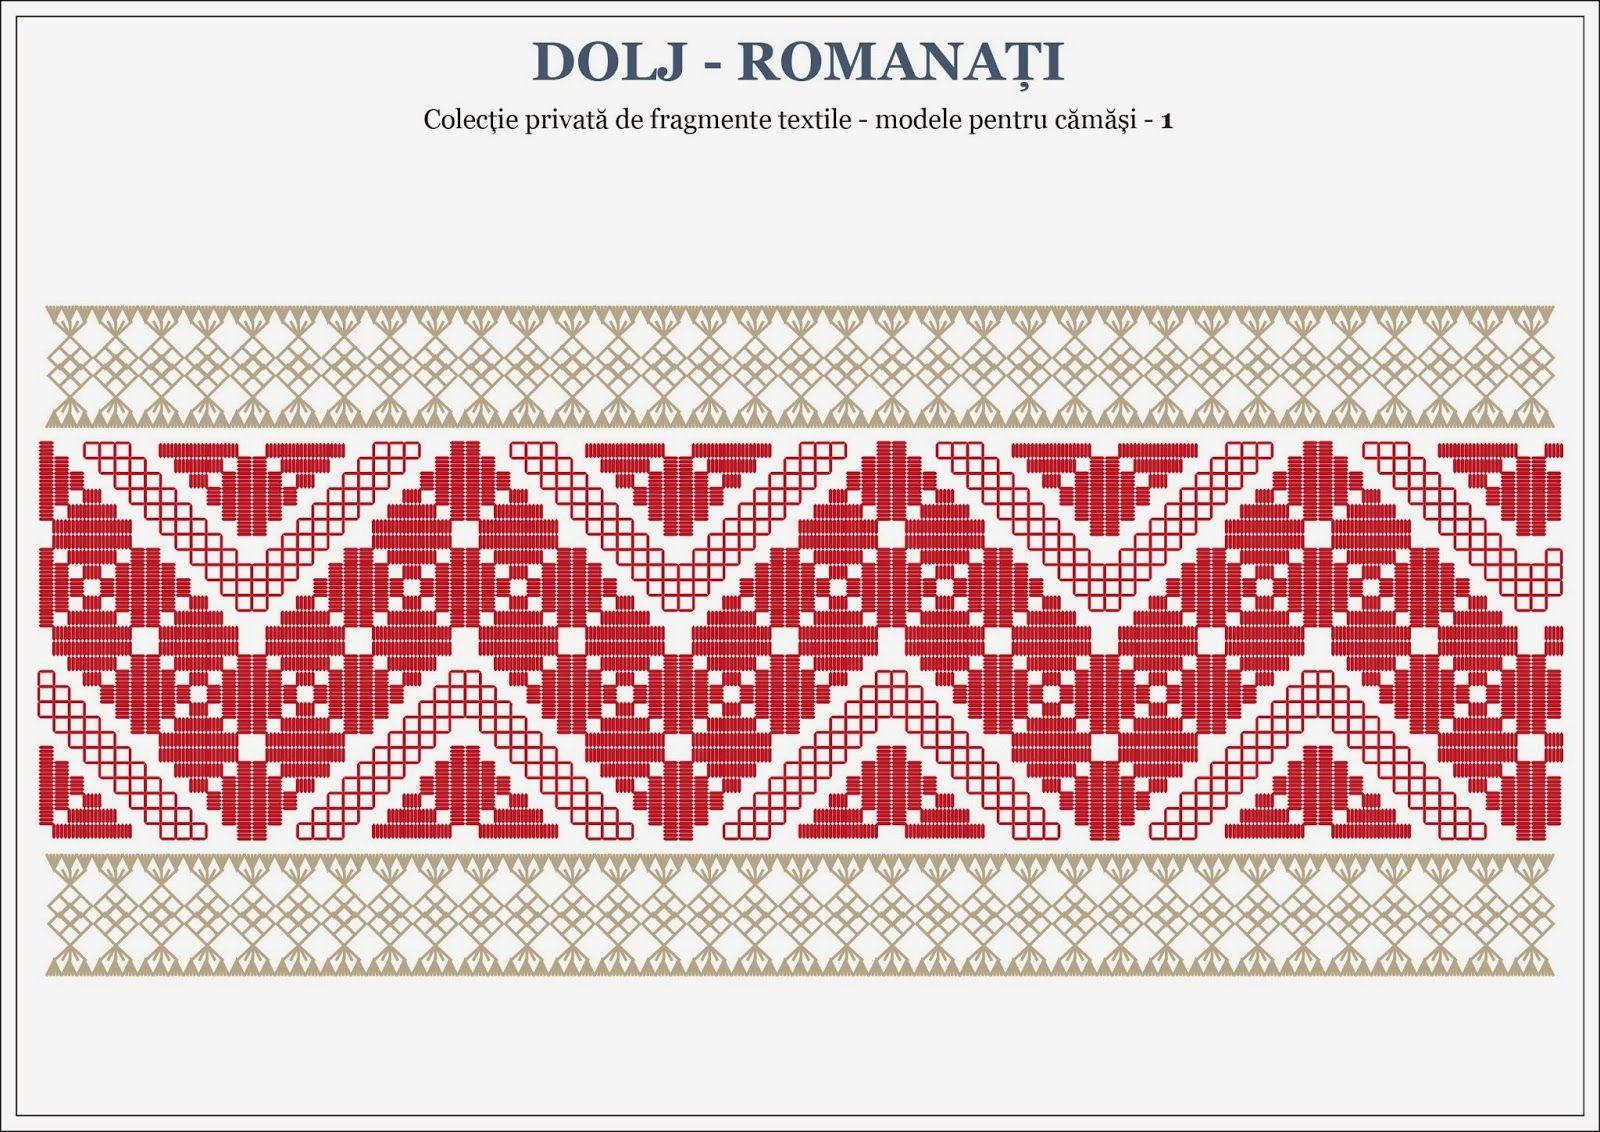 Semne Cusute Romanian Traditional Motifs For Shirts